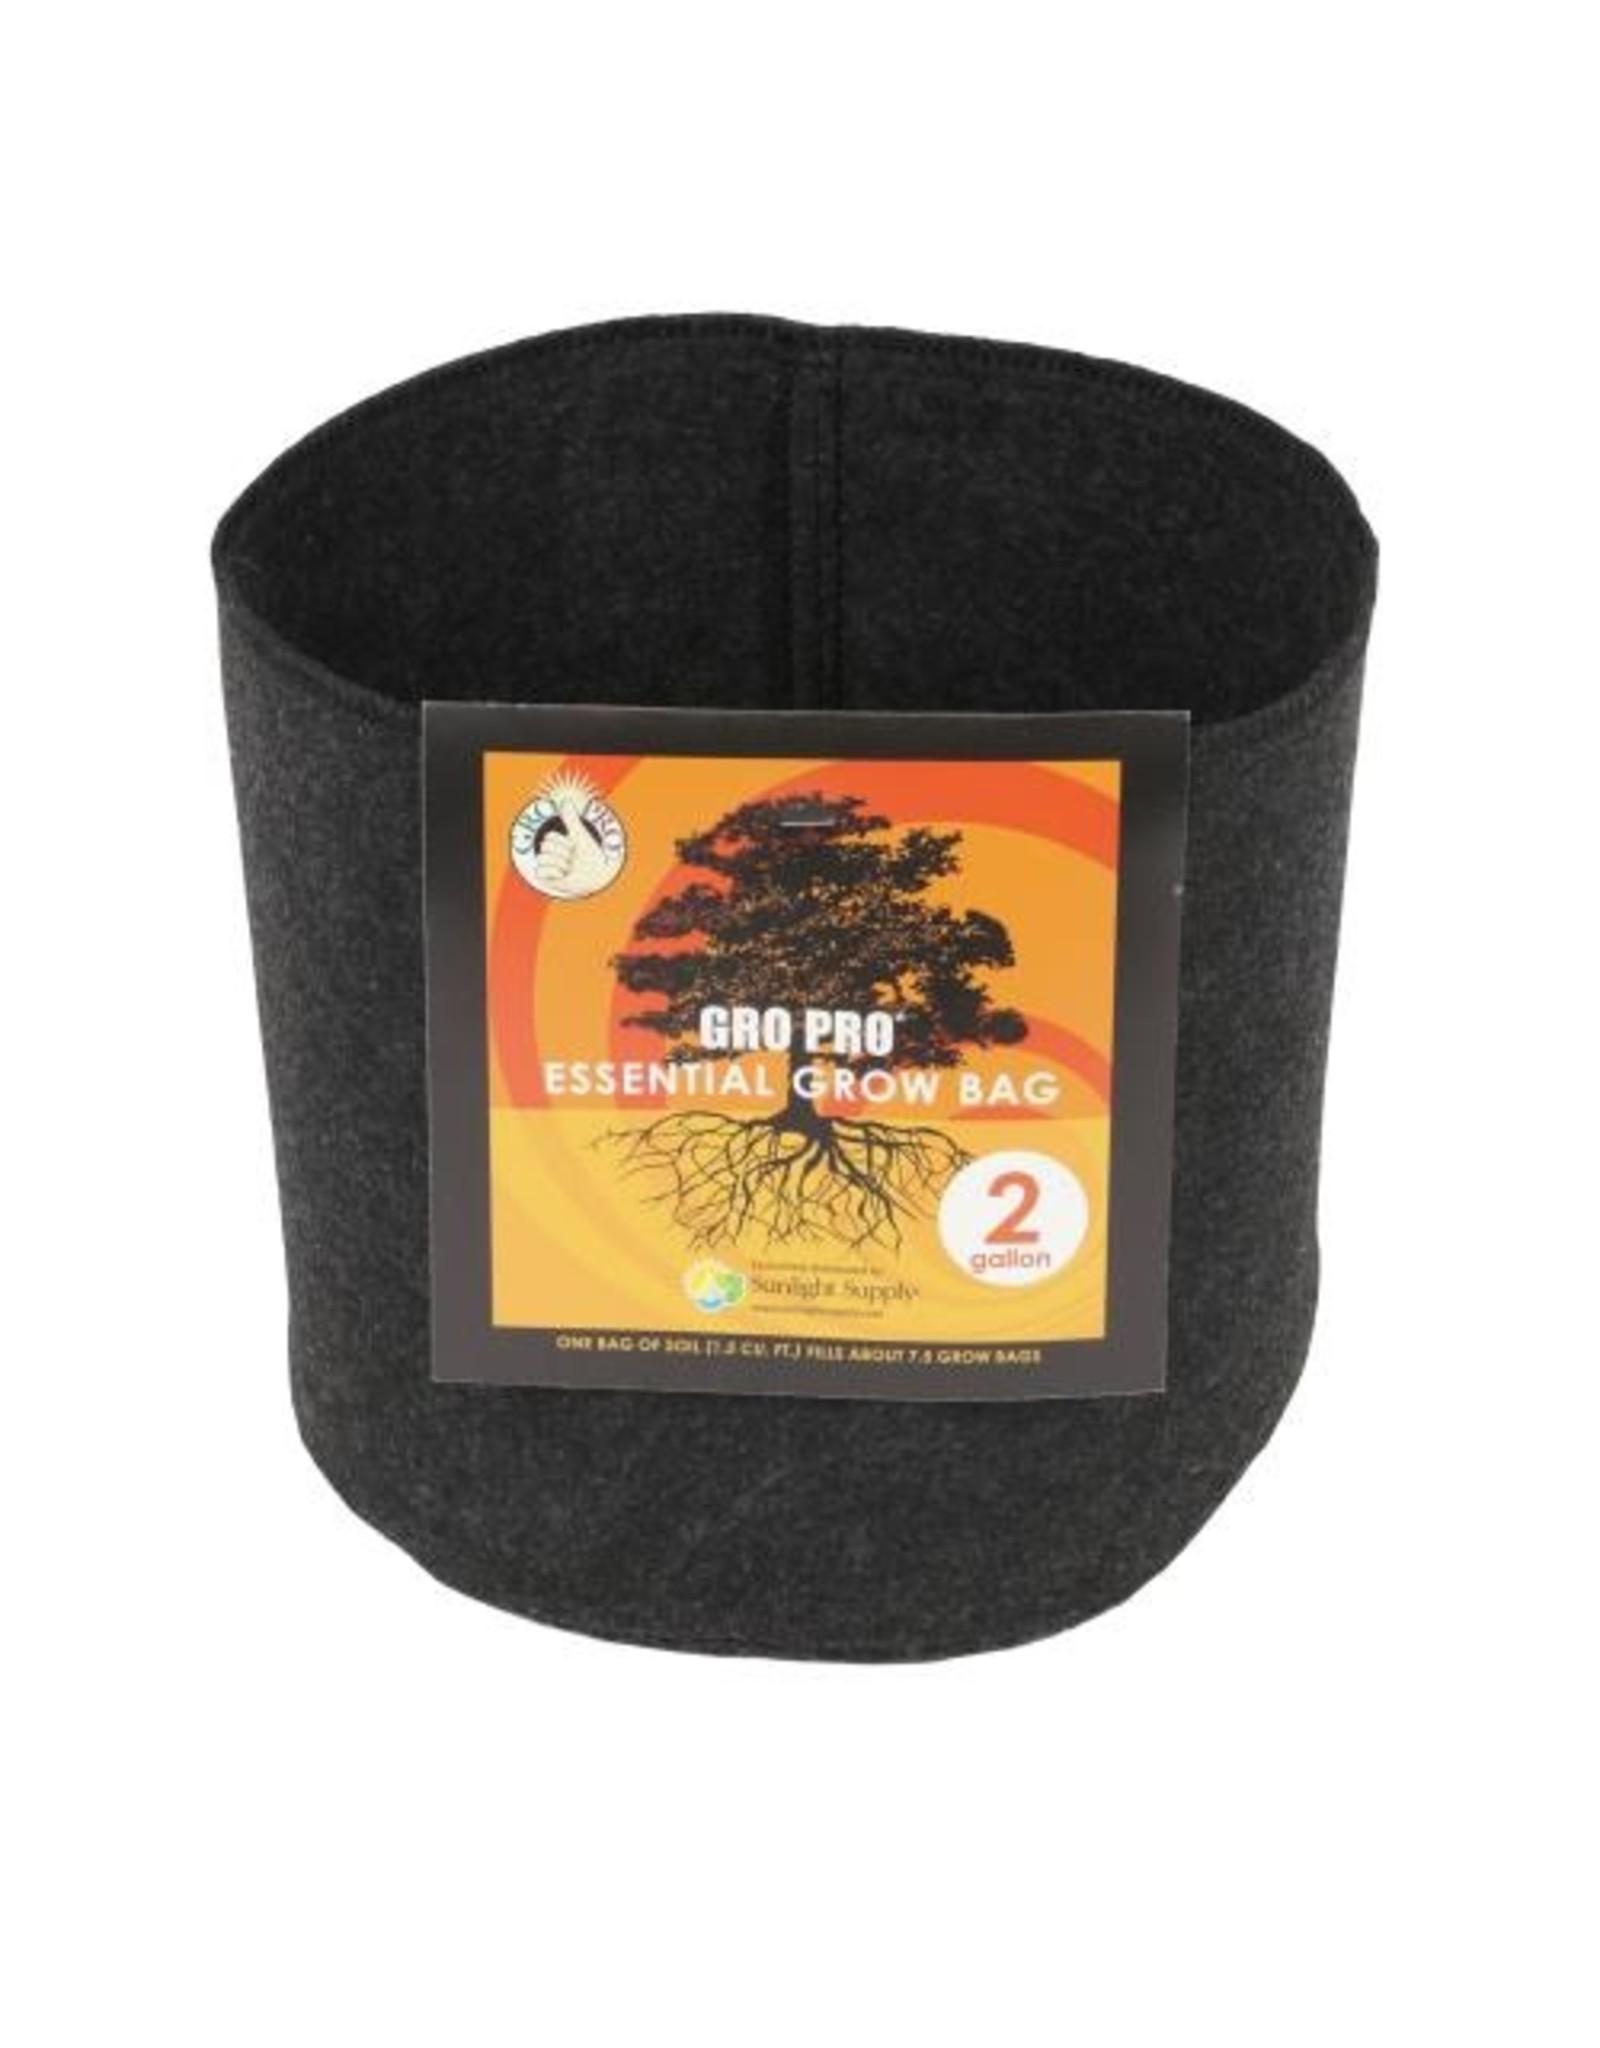 Gro Pro Gro Pro Essential Round Fabric Pot - Black 2 Gallon